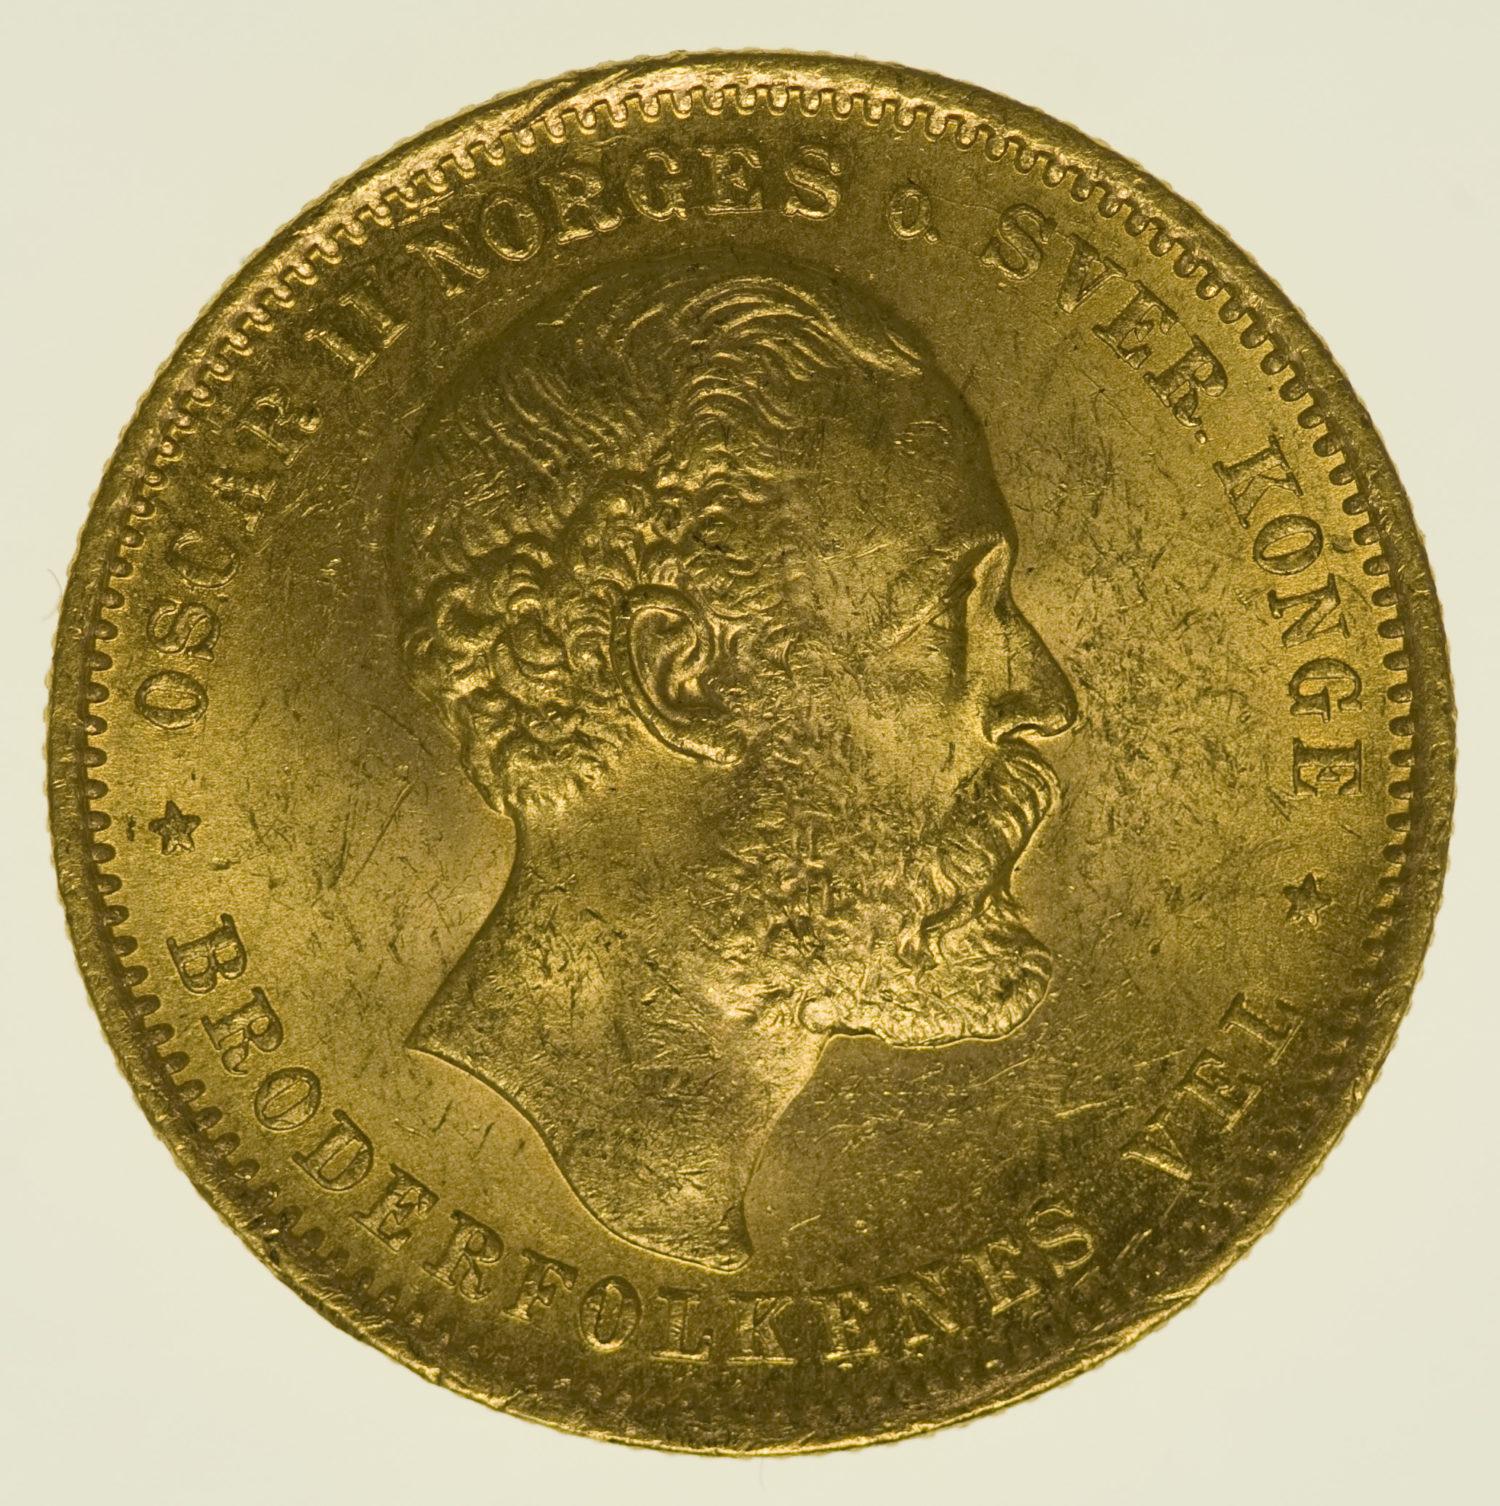 norwegen - Norwegen Oskar II. 20 Kronen 1876